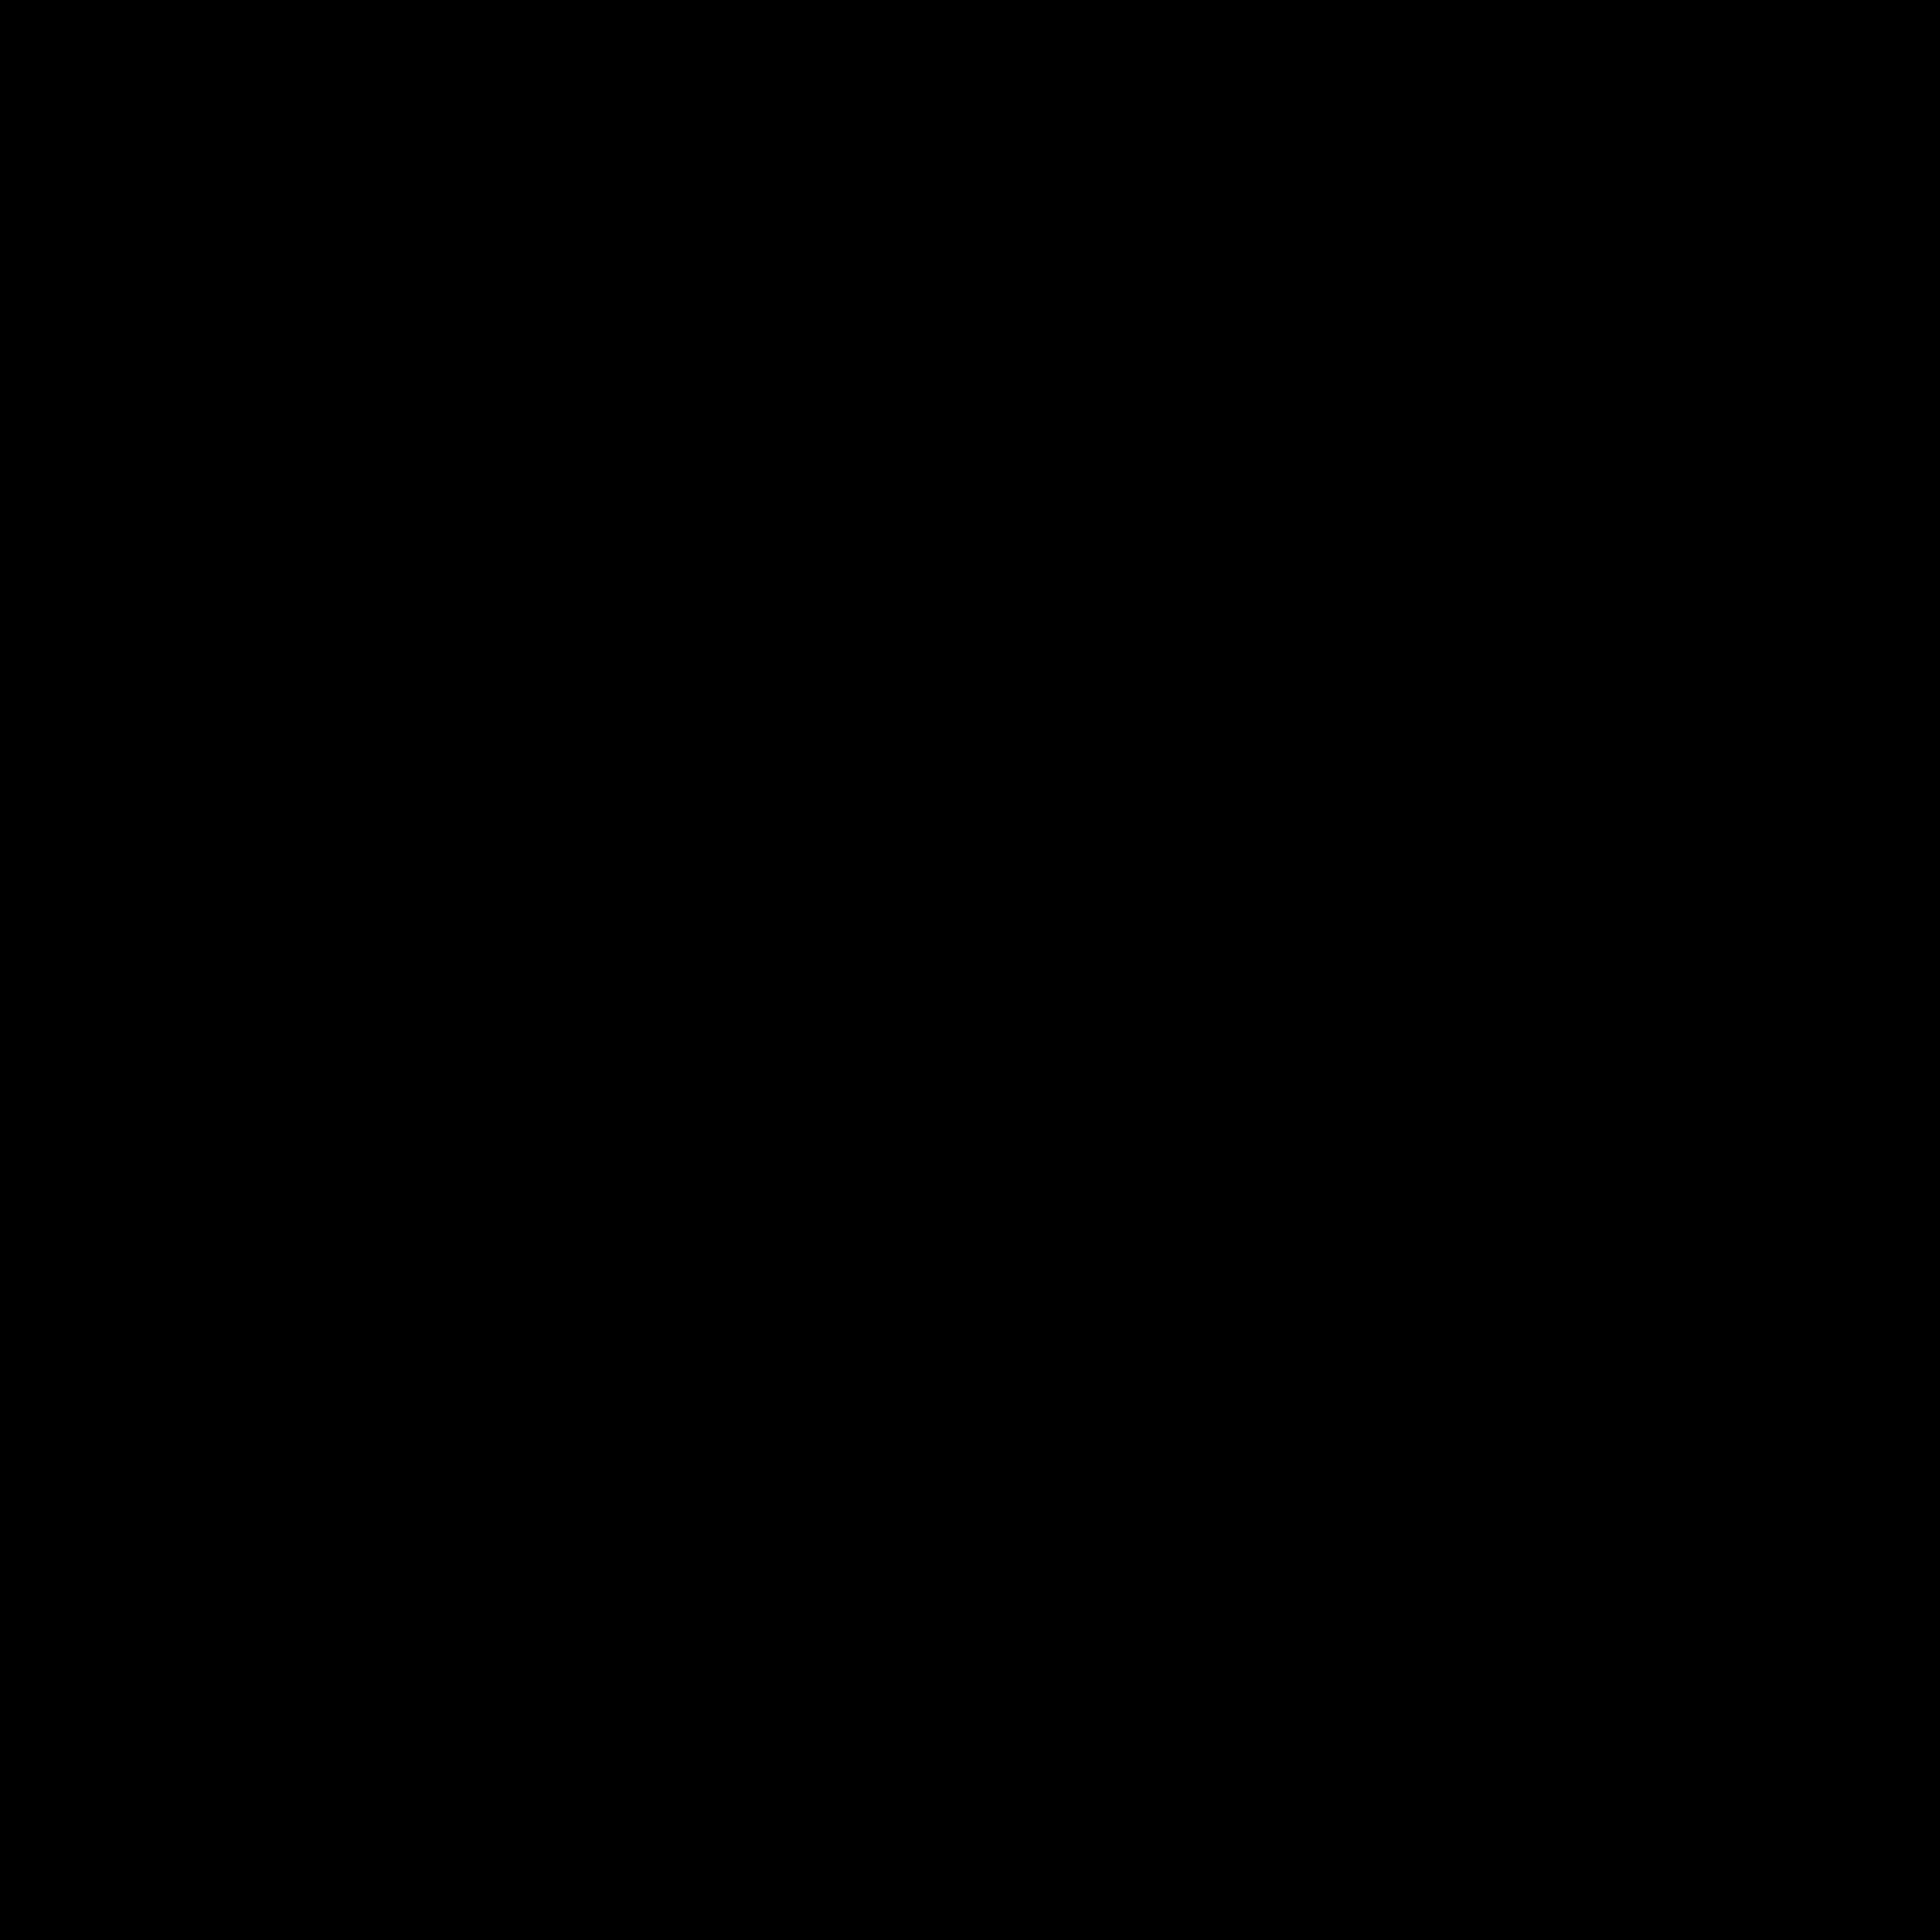 clipart transparent stock svg symbol earth #116115890